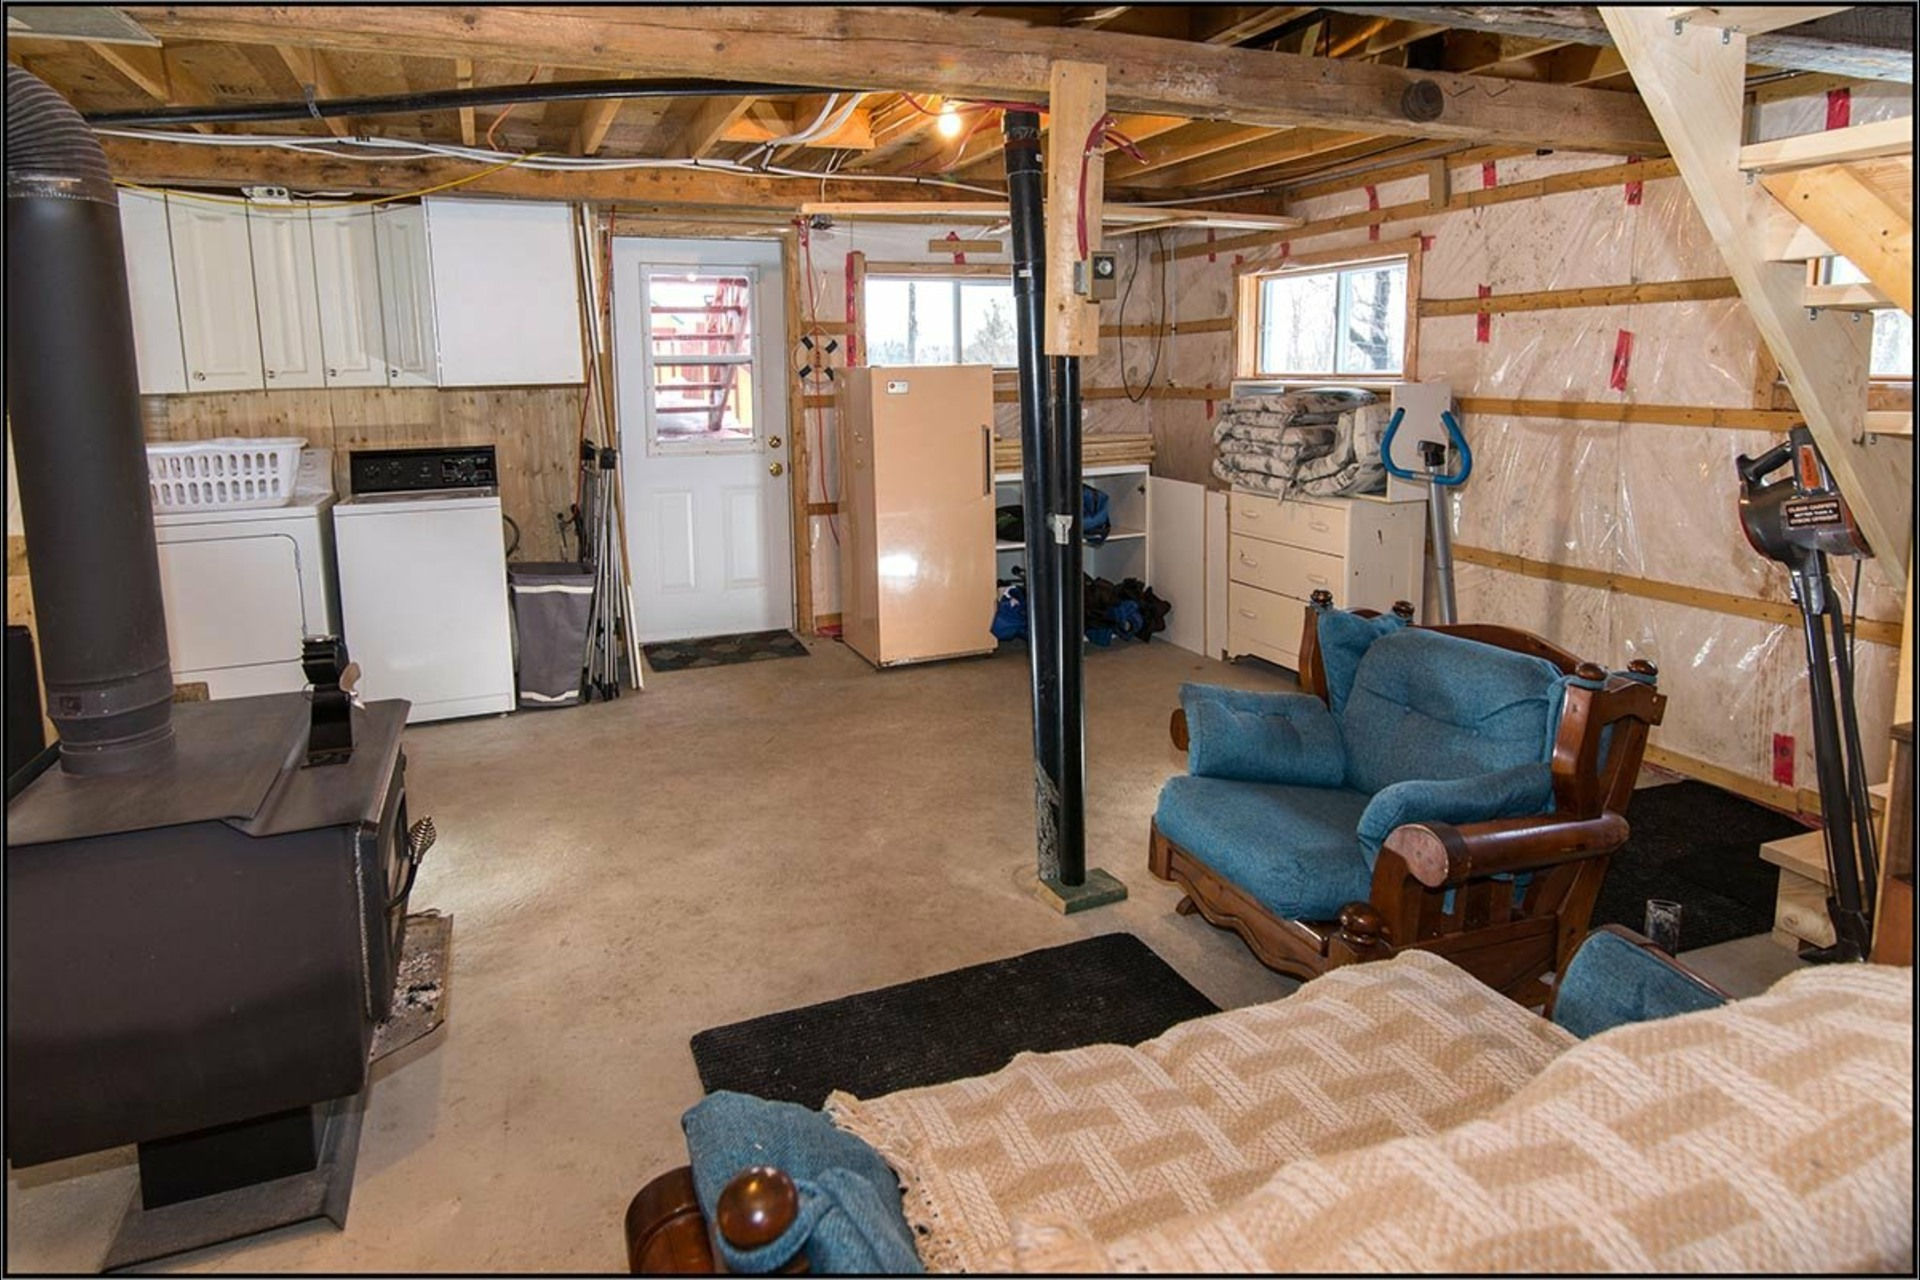 image 9 - House For sale Saint-Aubert - 6 rooms